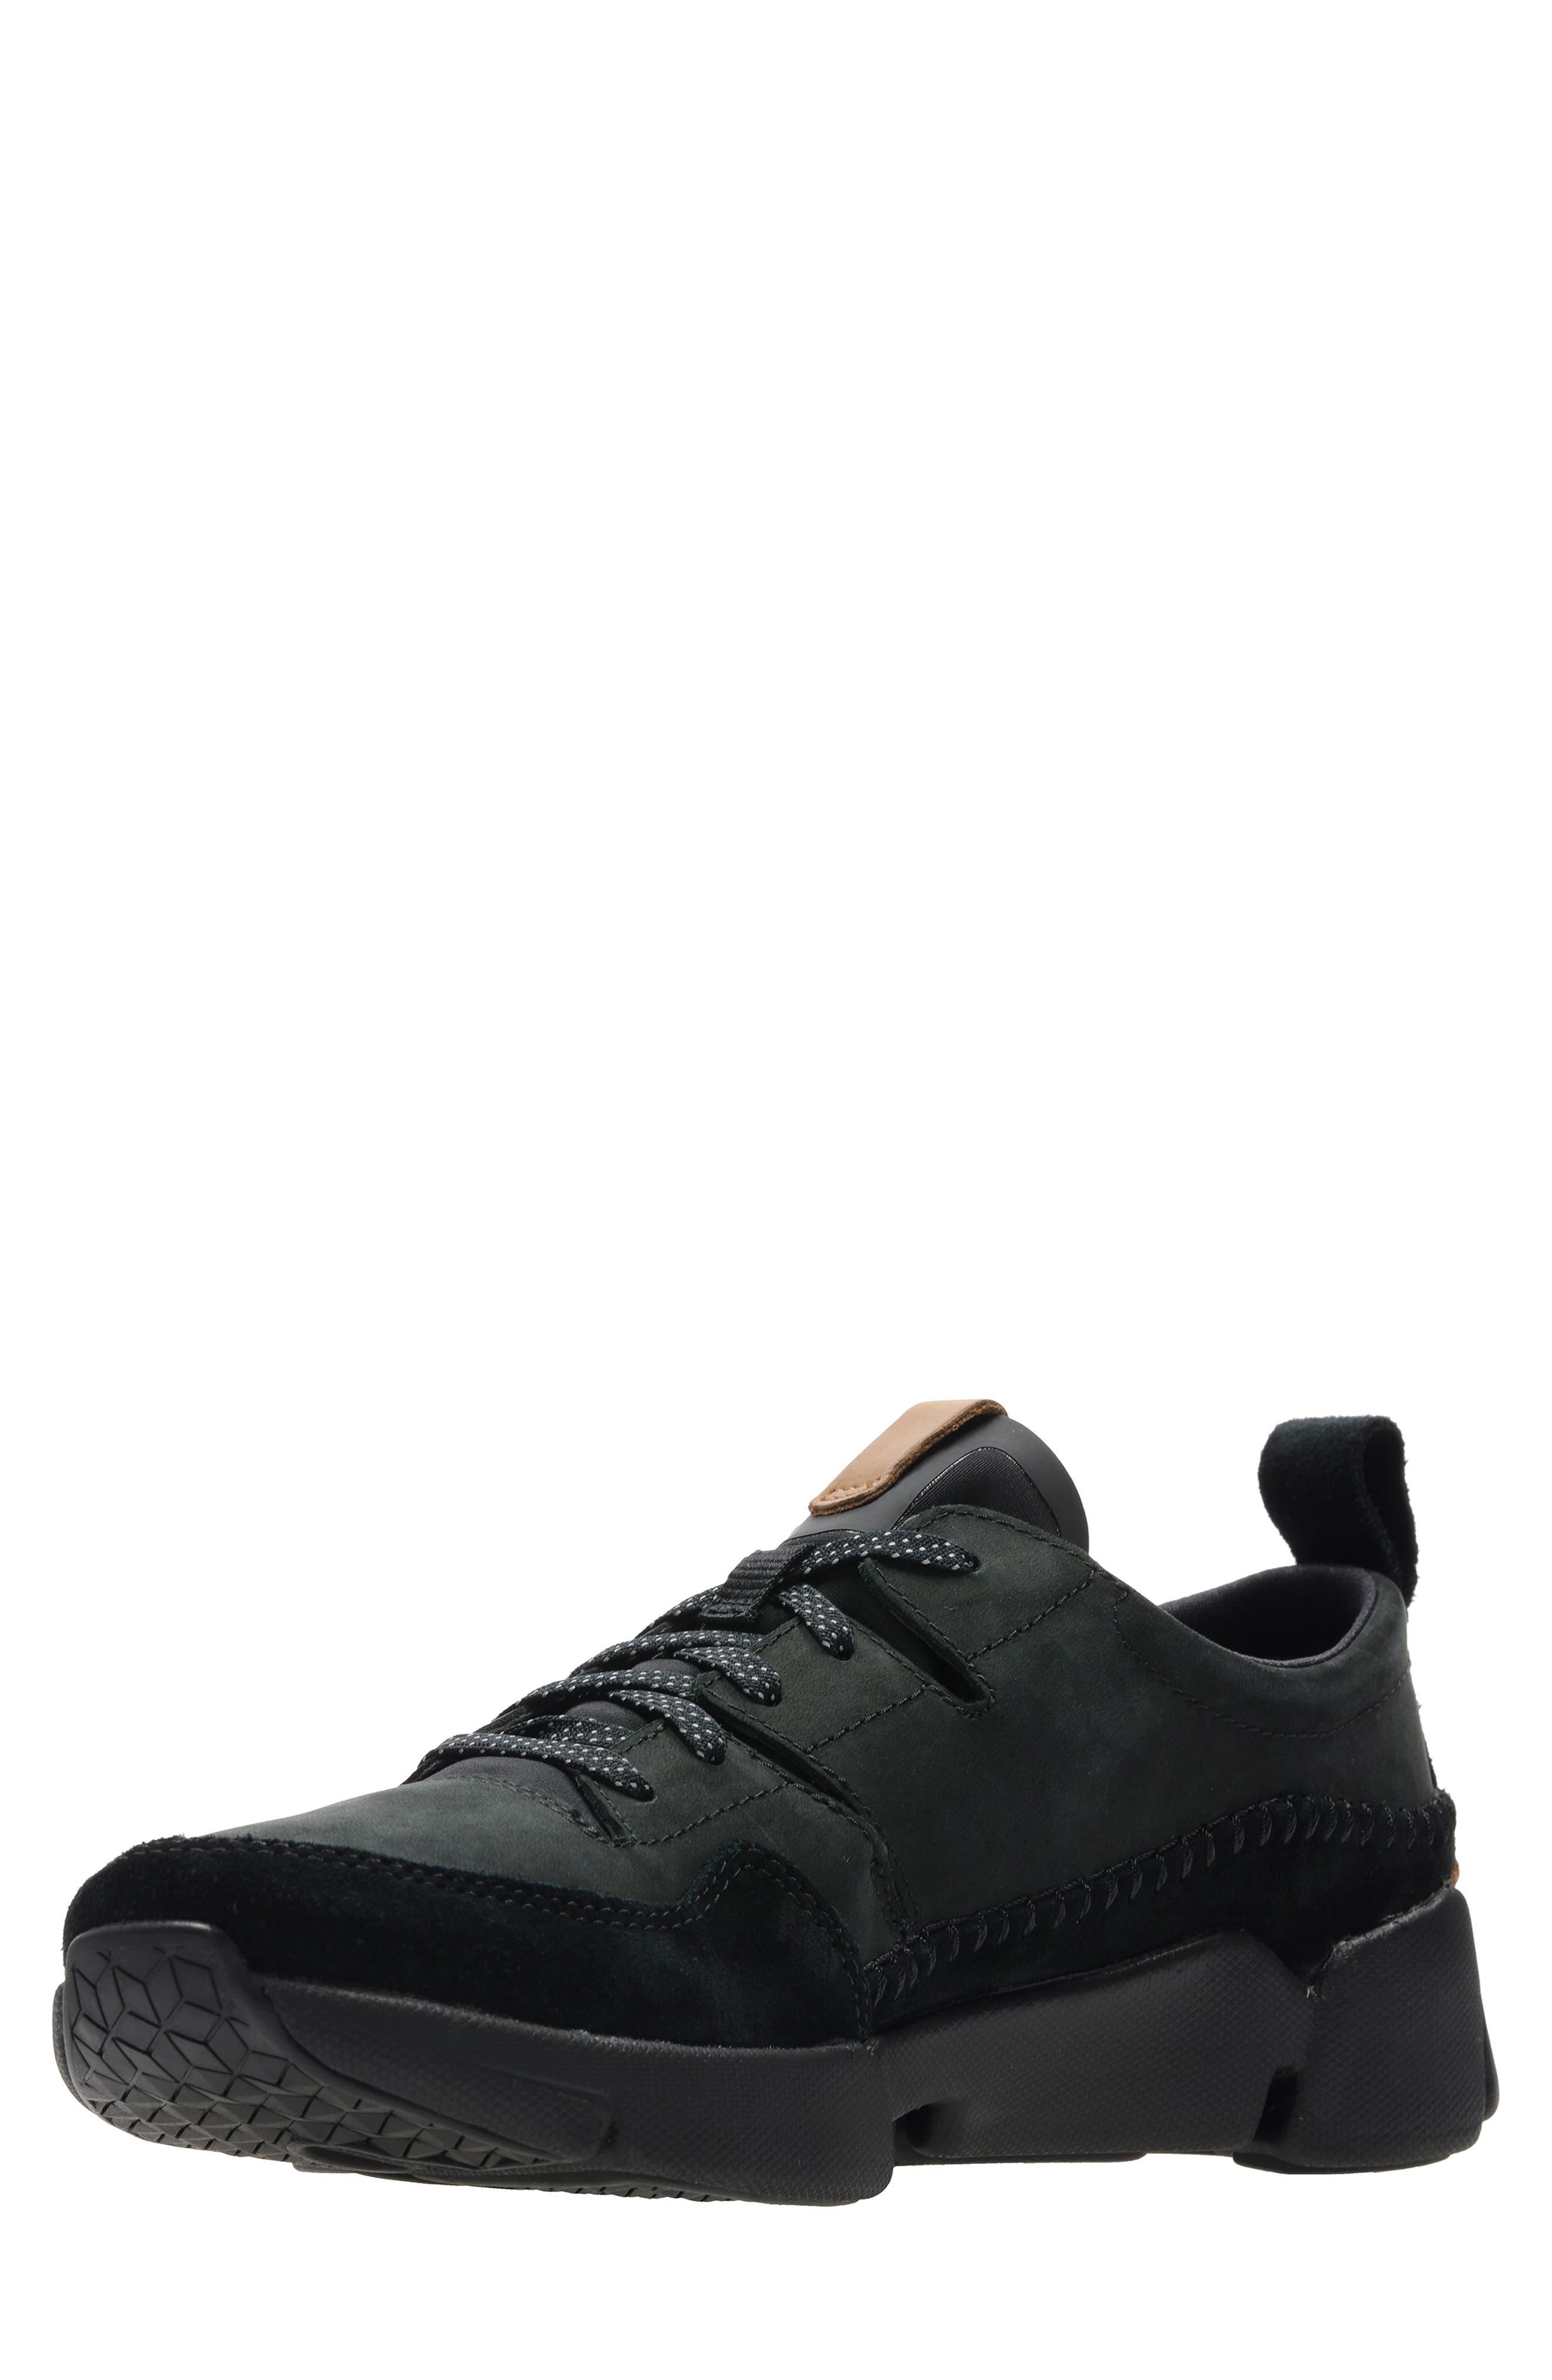 Tri-Active Run Sneaker,                             Alternate thumbnail 5, color,                             BLACK LEATHER